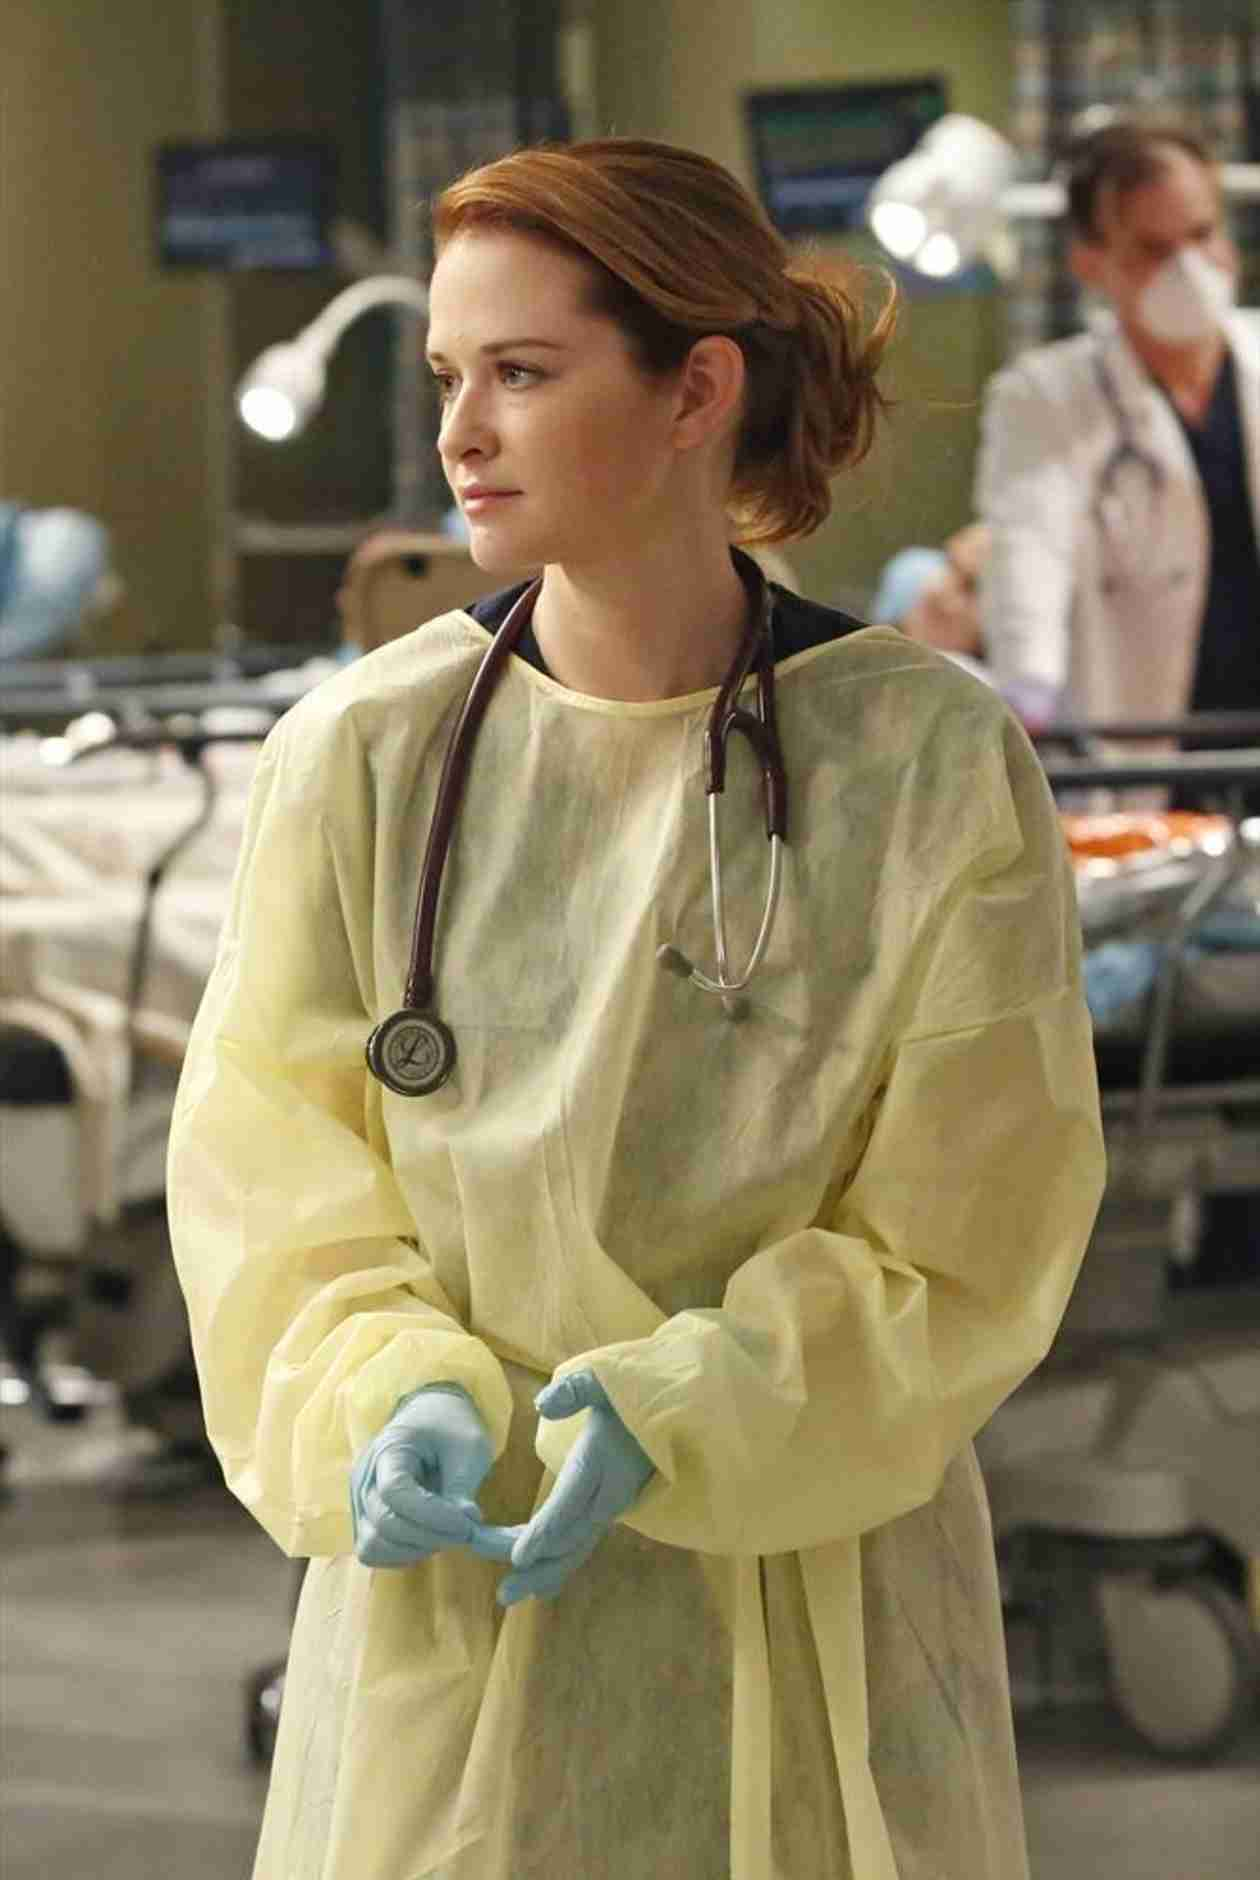 Grey's Anatomy Spoiler: Season 11, Episode 2 Title Revealed